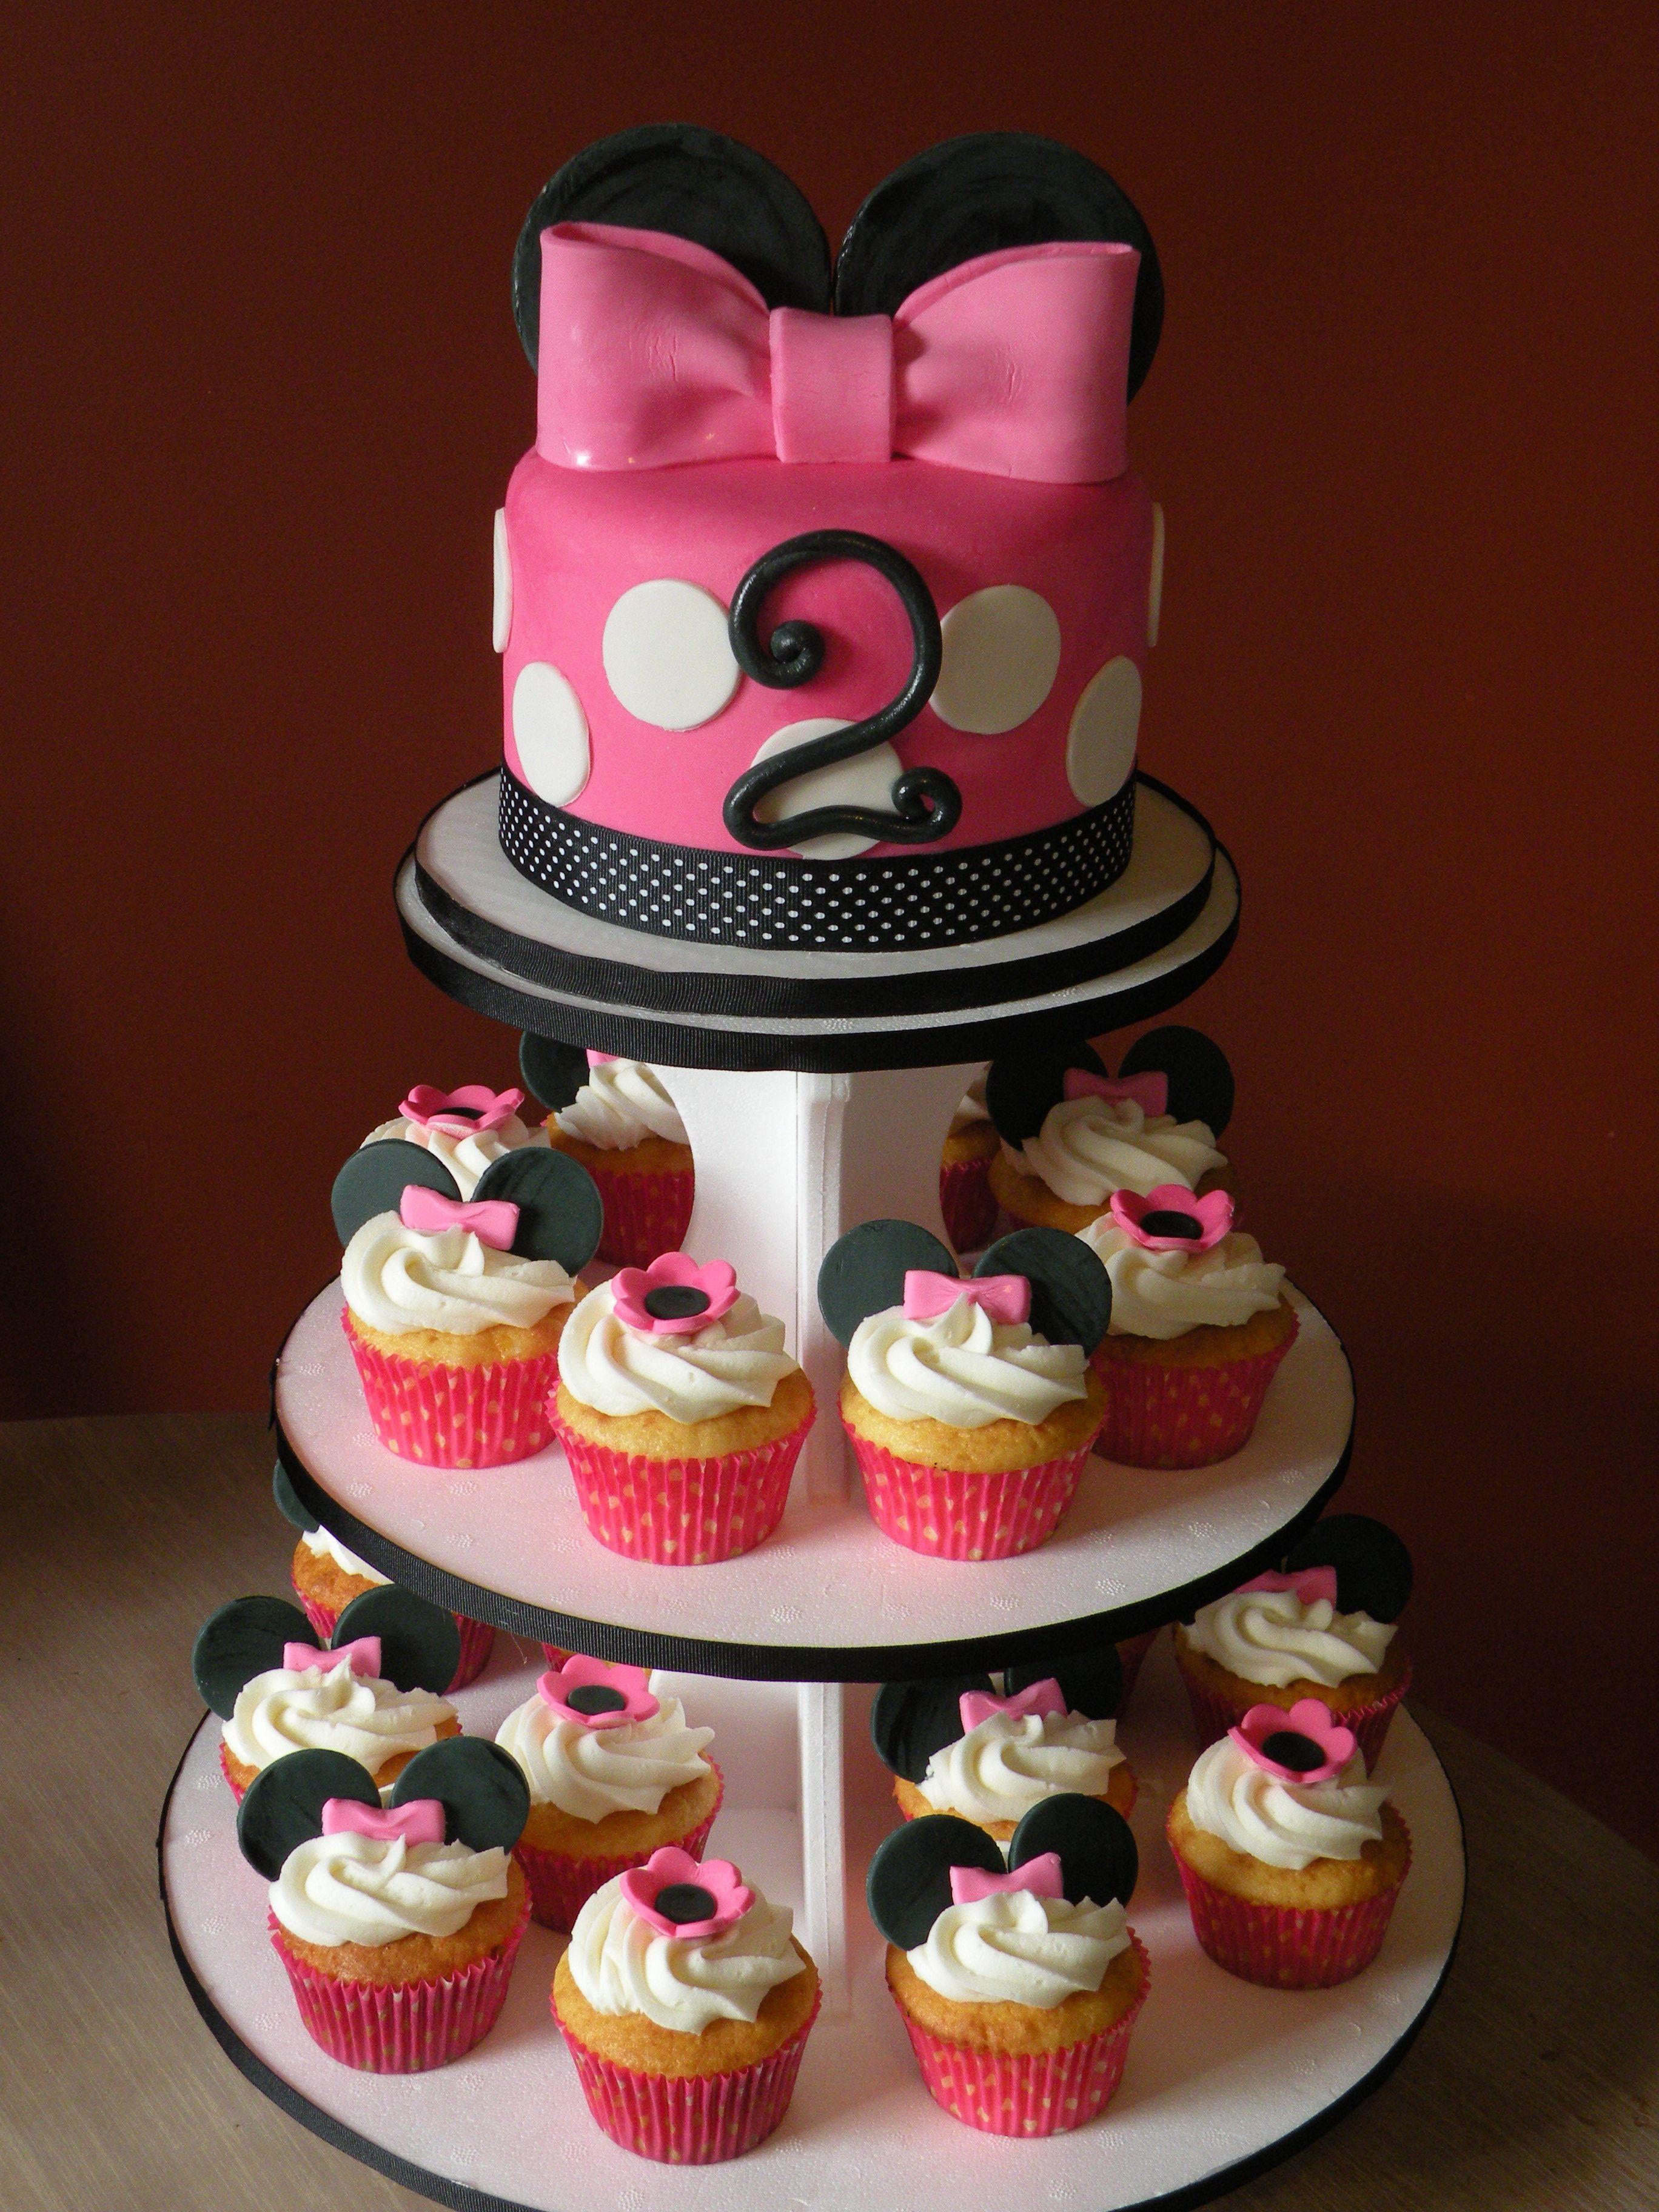 minnie mouse birthday cakes minnie mouse cake flower cupcakes cupcake ...